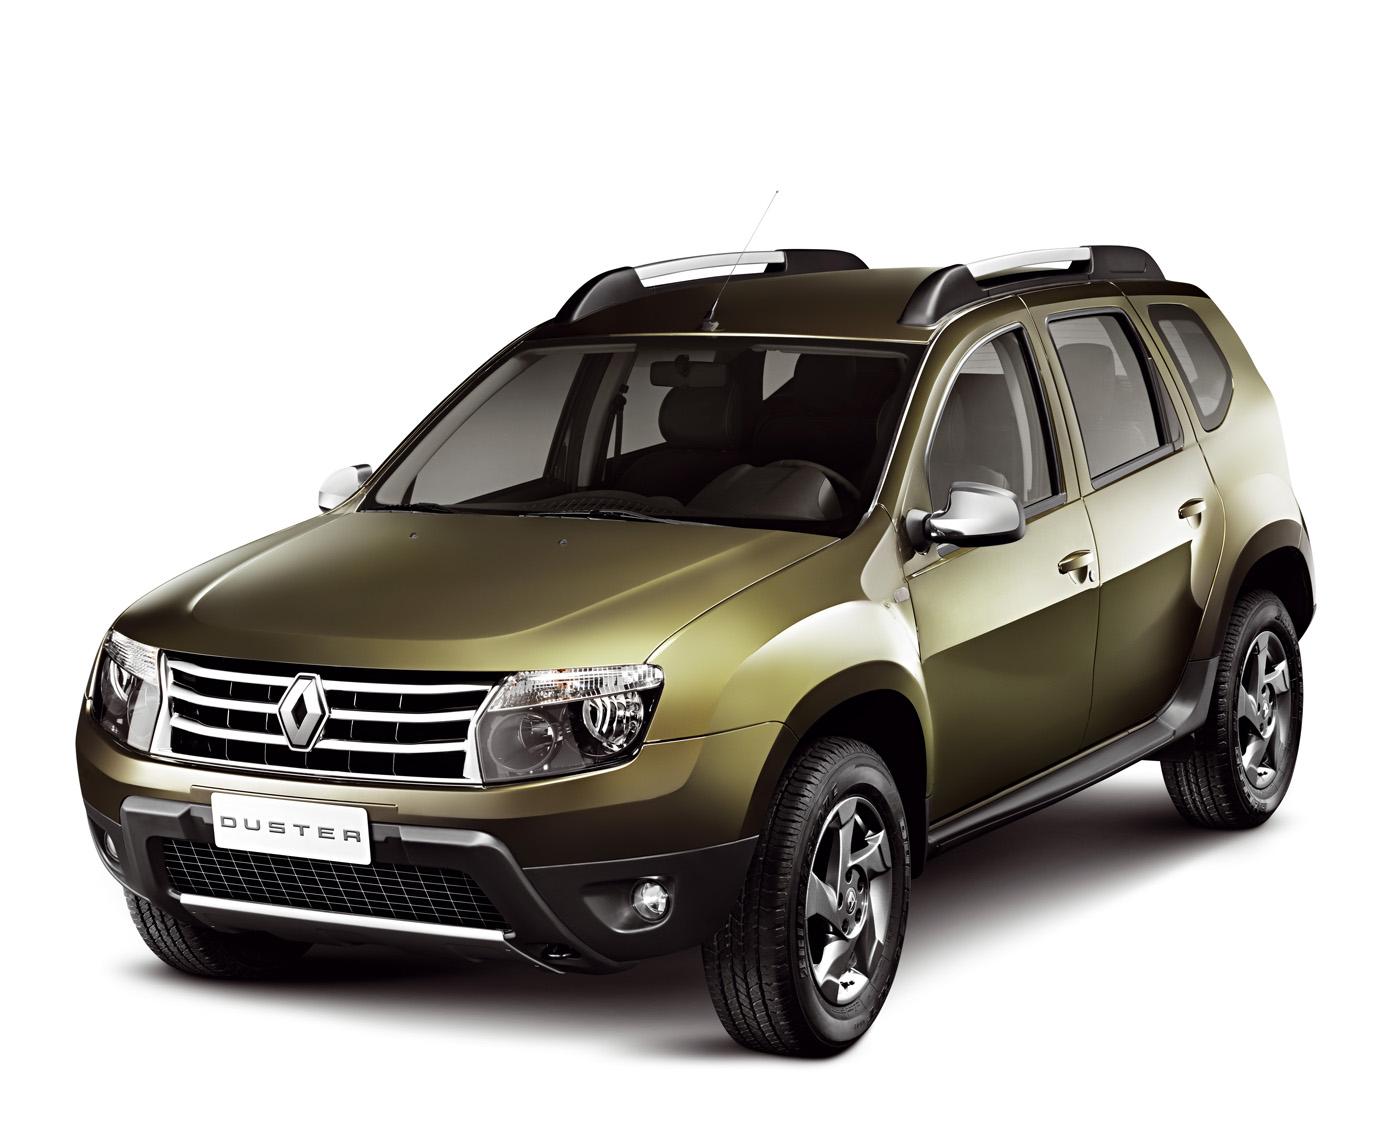 Renault Duster chega ao Brasil por R$ 50.900 | All The Cars – Tudo